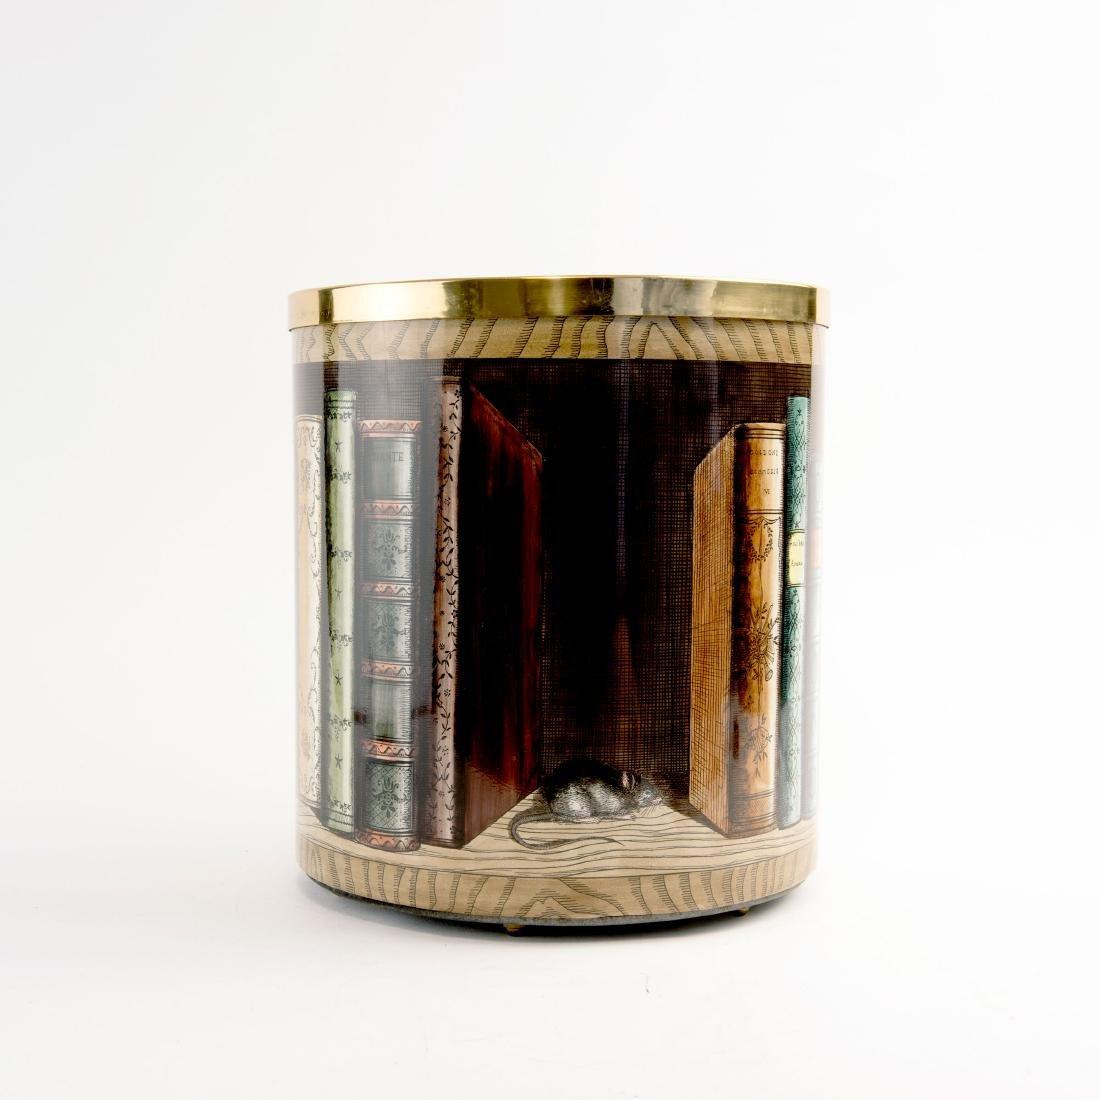 'Libri' wastepaper basket, 1950s - 2